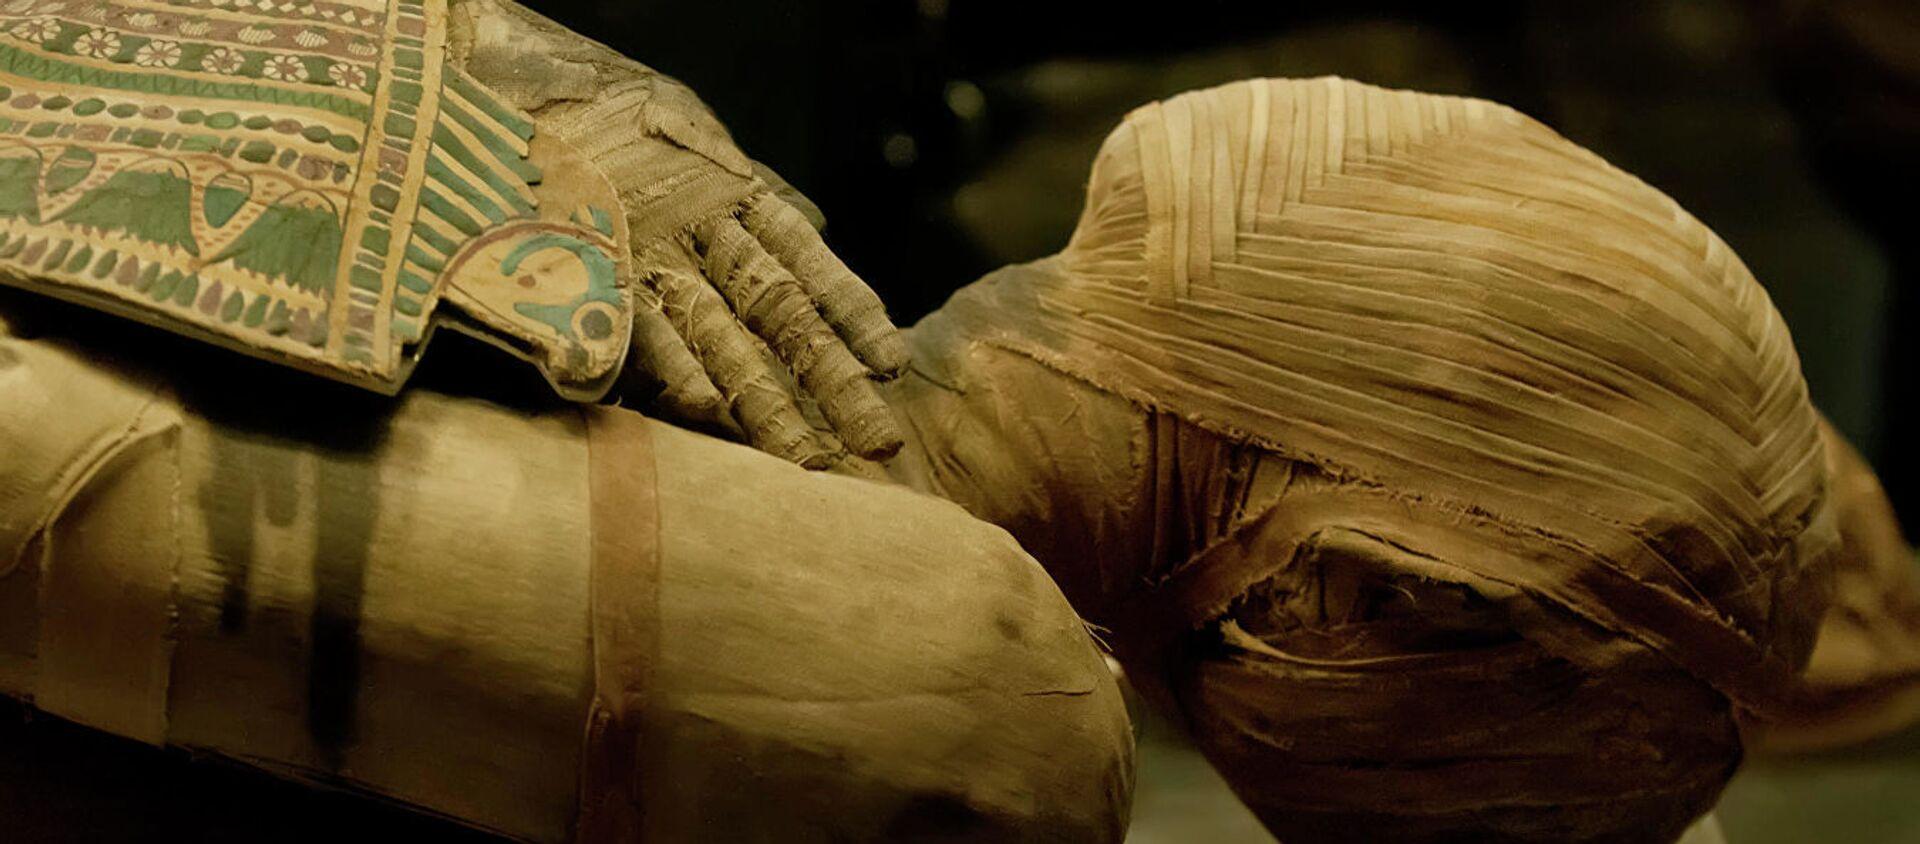 La mummia - Sputnik Italia, 1920, 30.04.2021